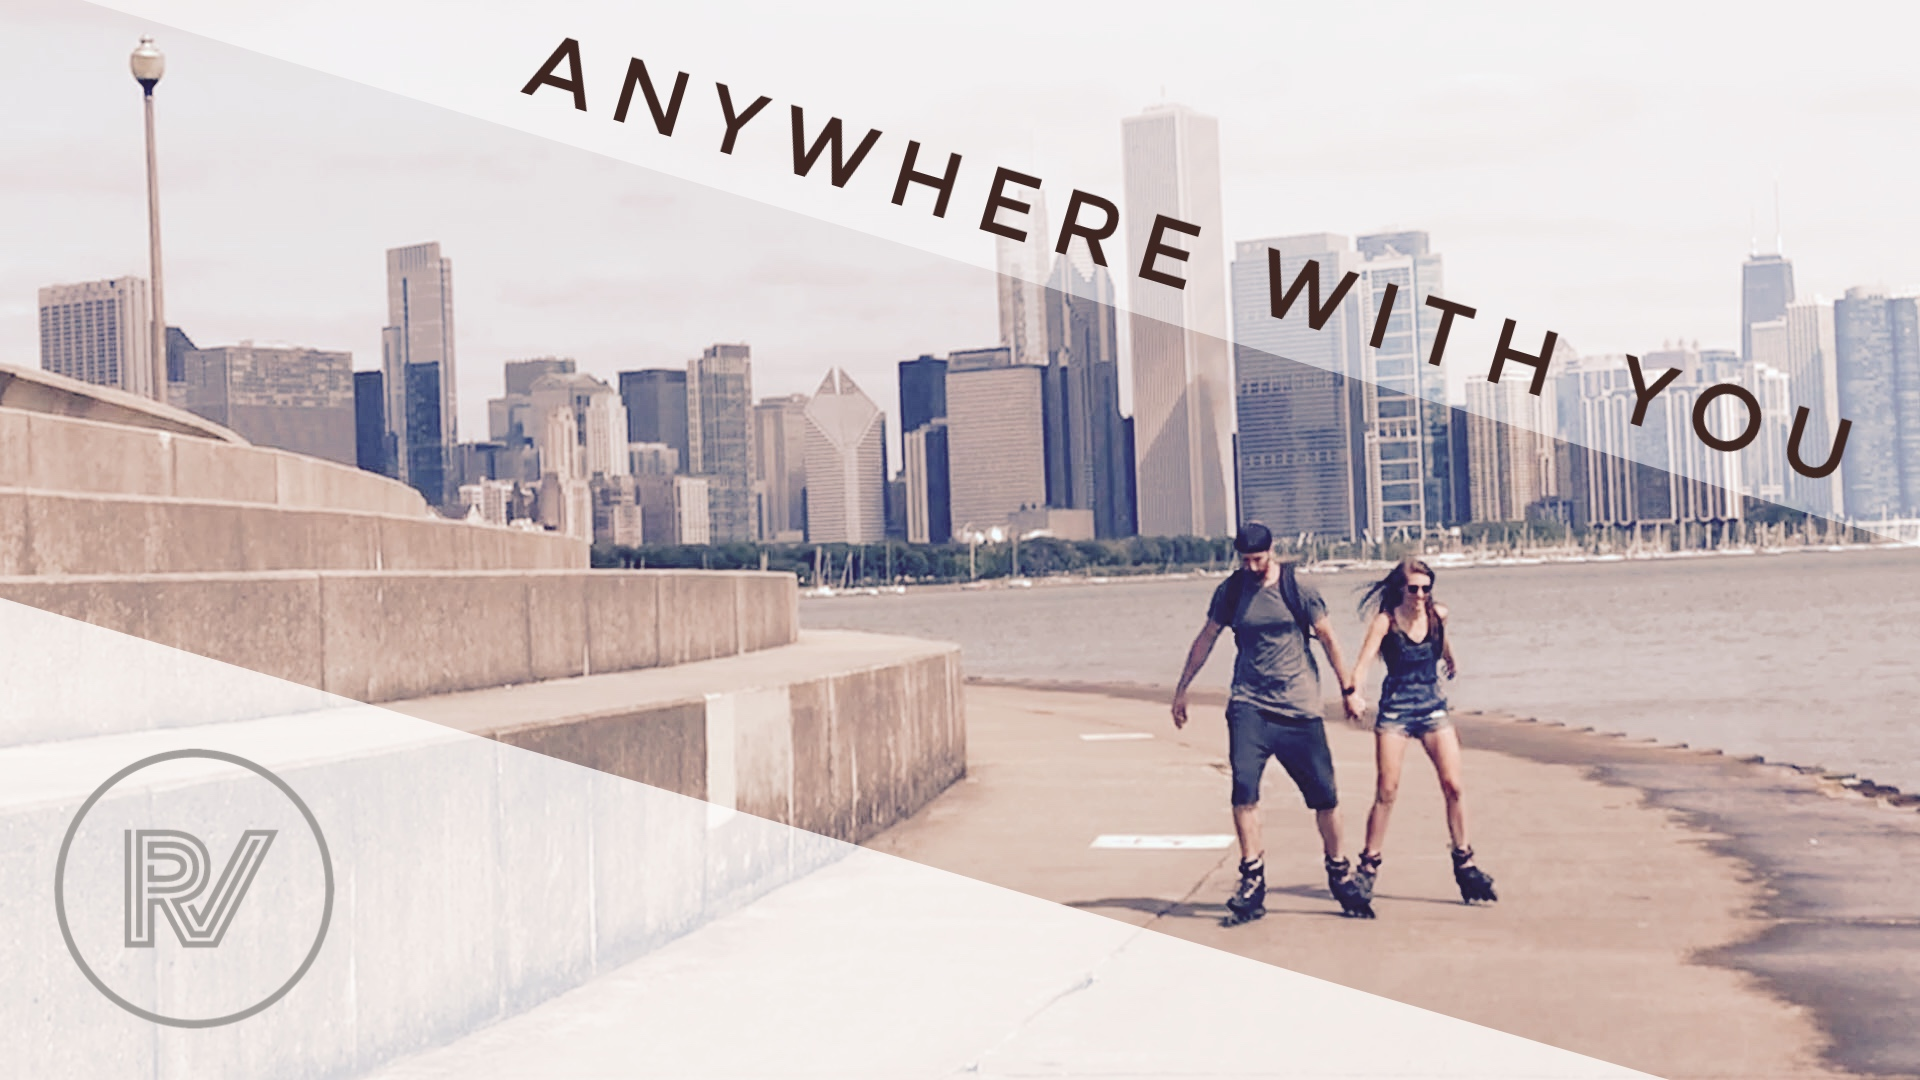 Anywhere with You Youtube Art.JPG